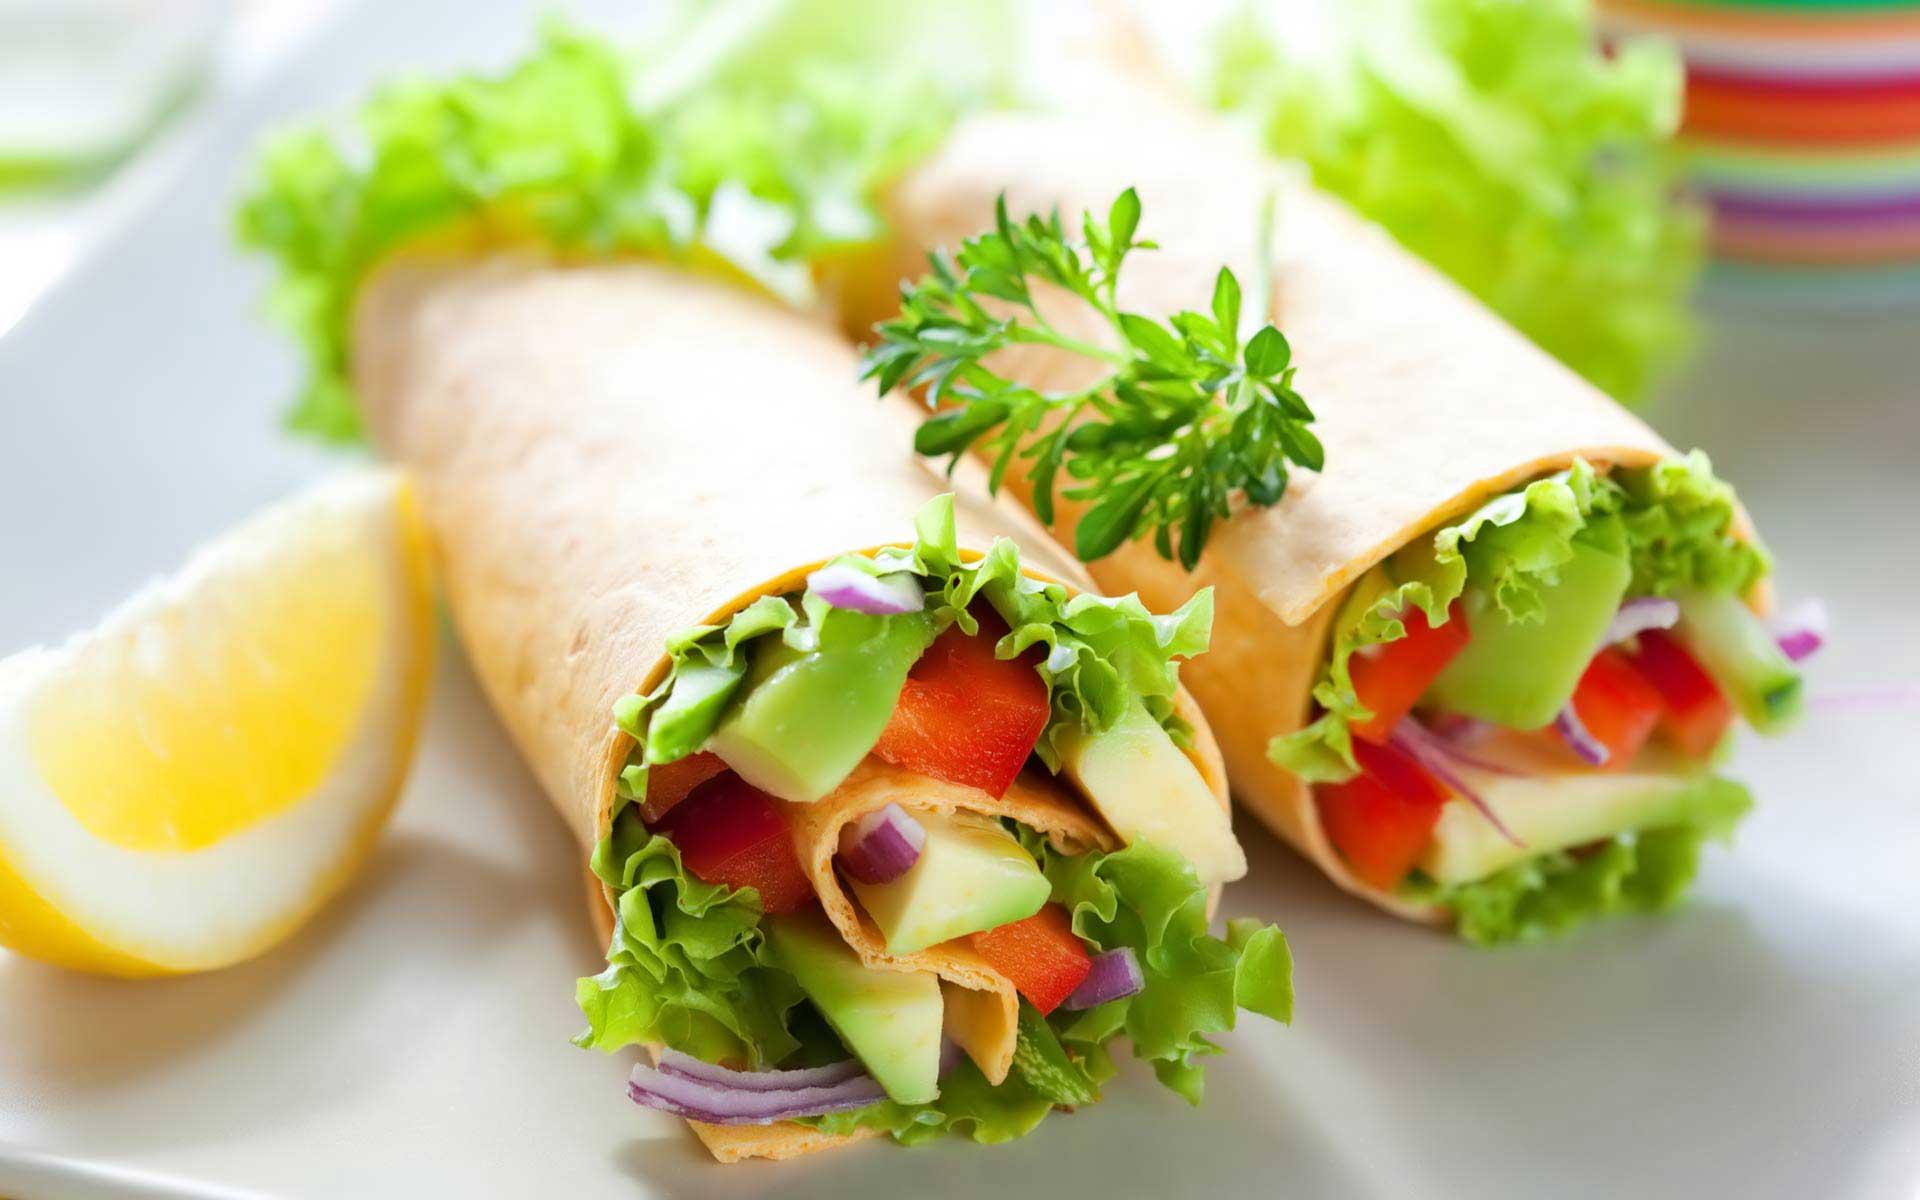 thebestcookierecipes - vejetaryen yemekleri